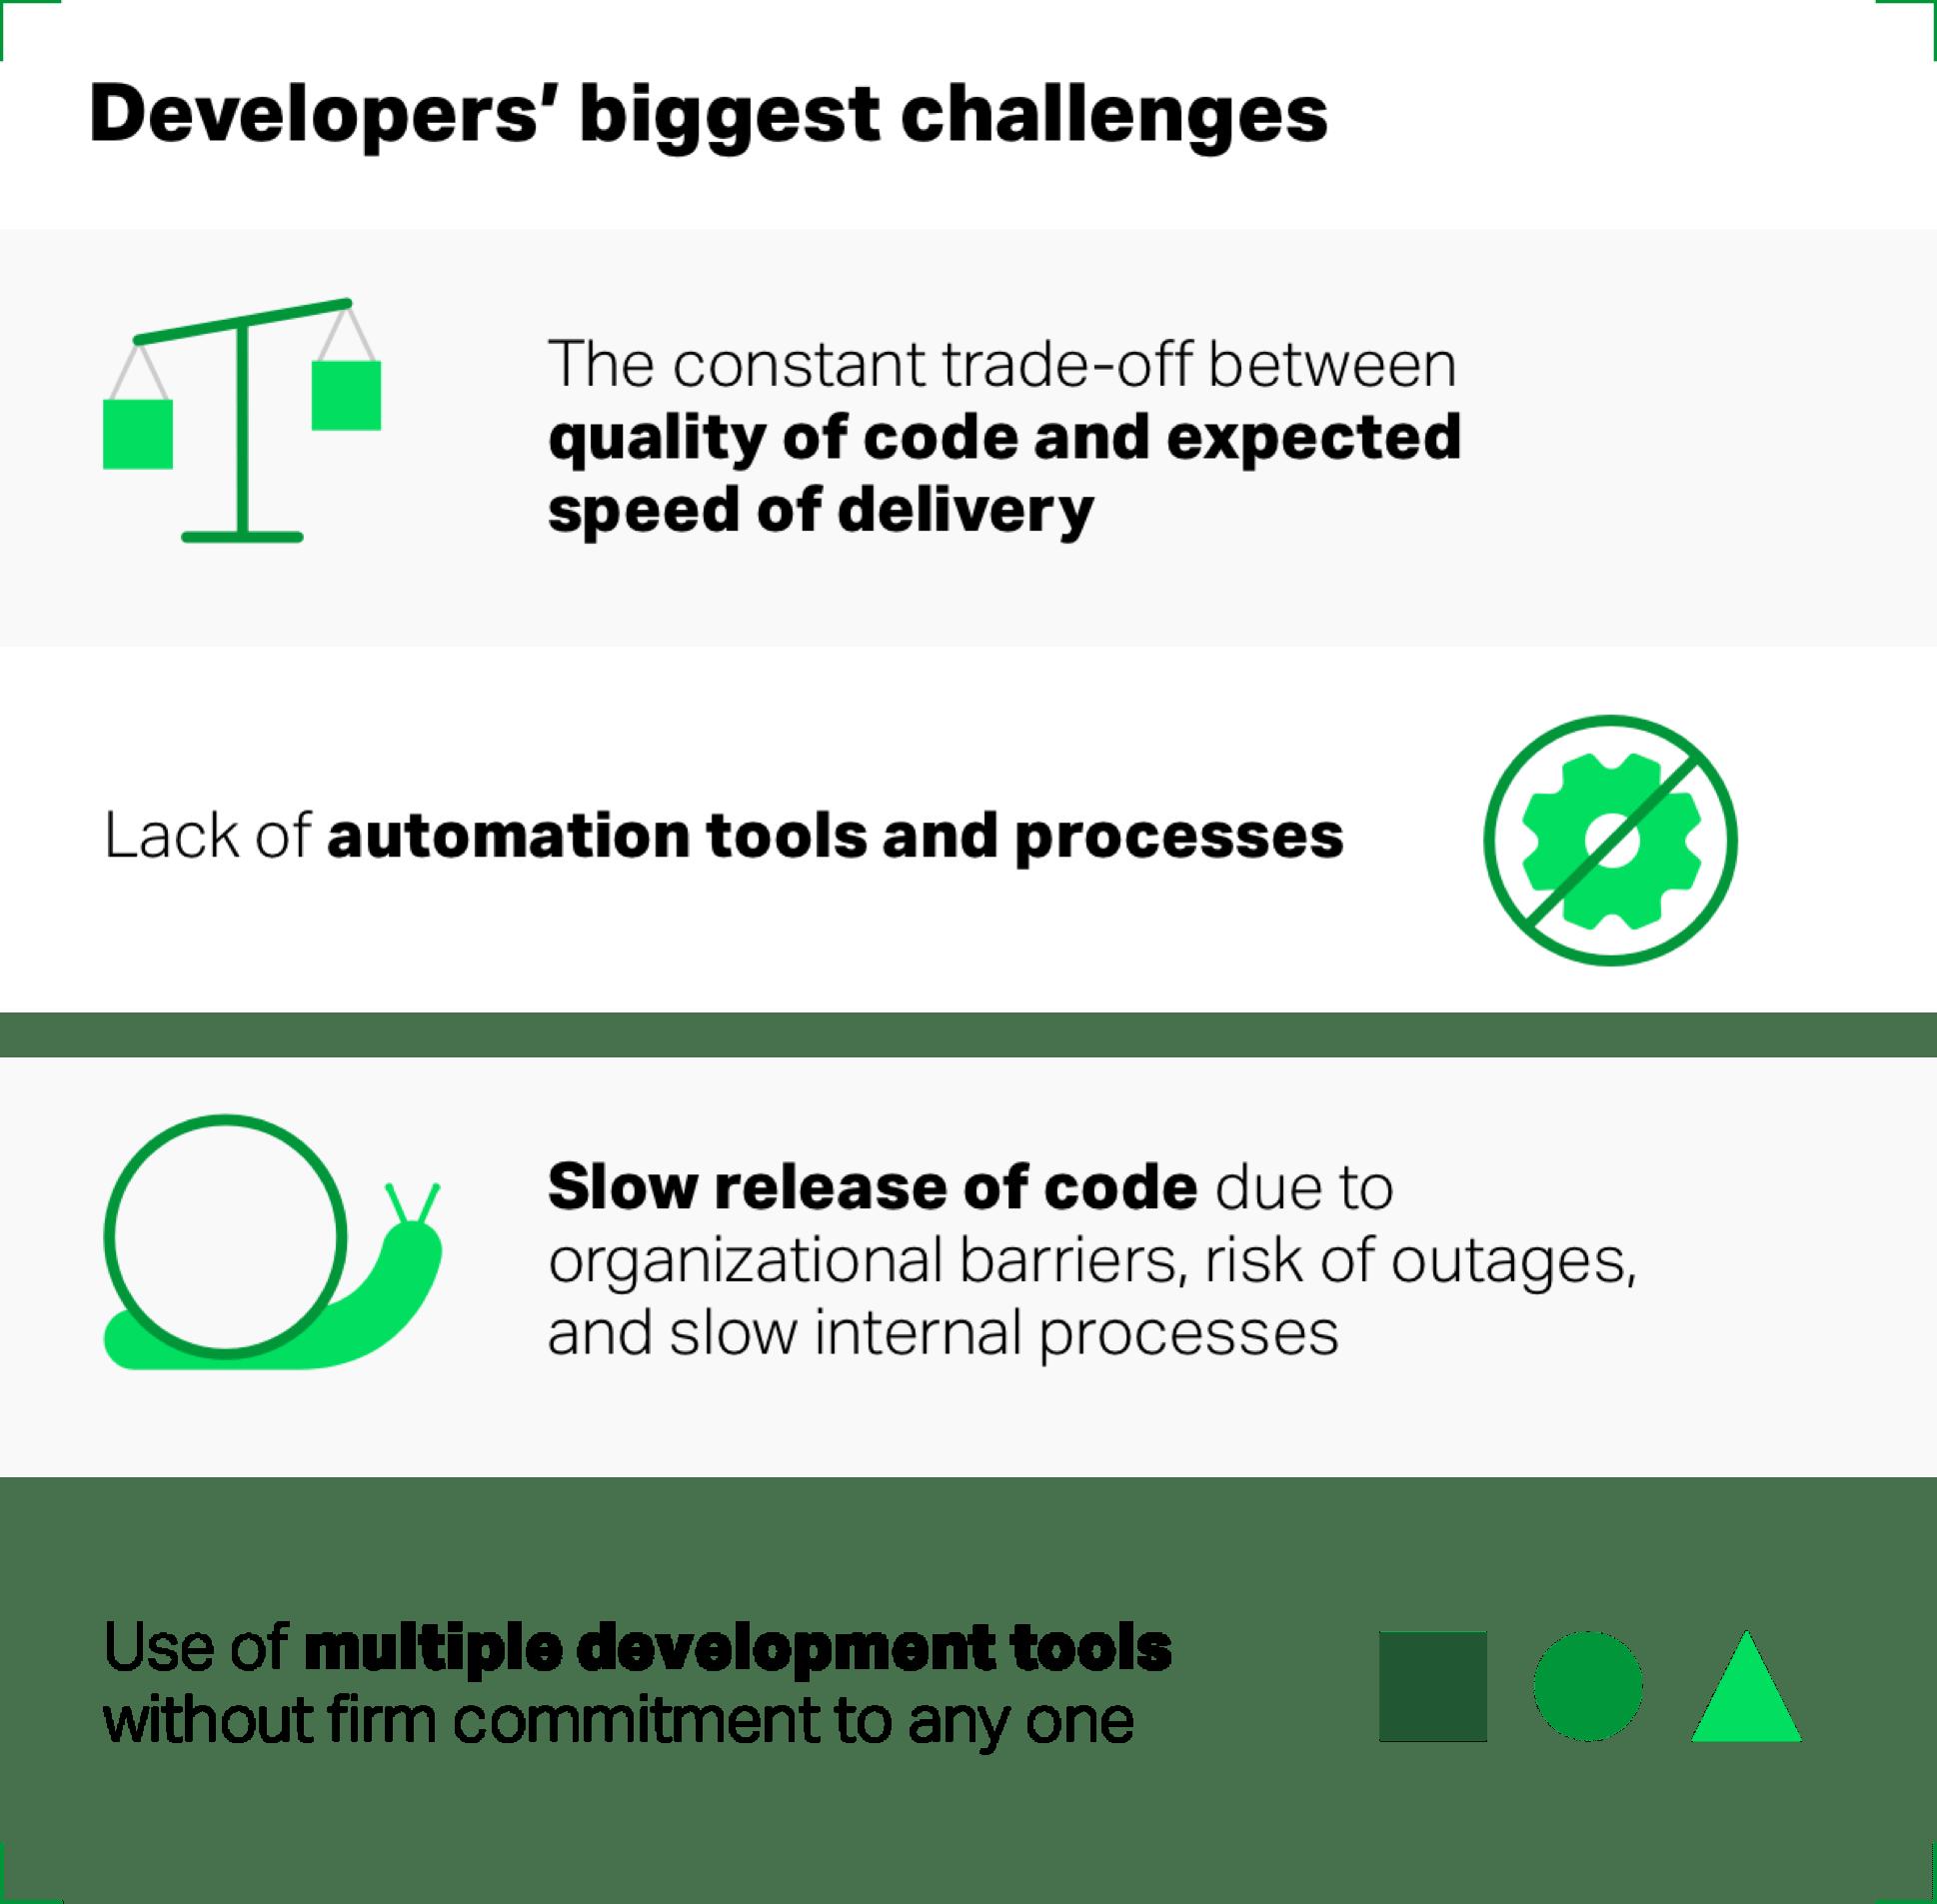 nginx infographic 10